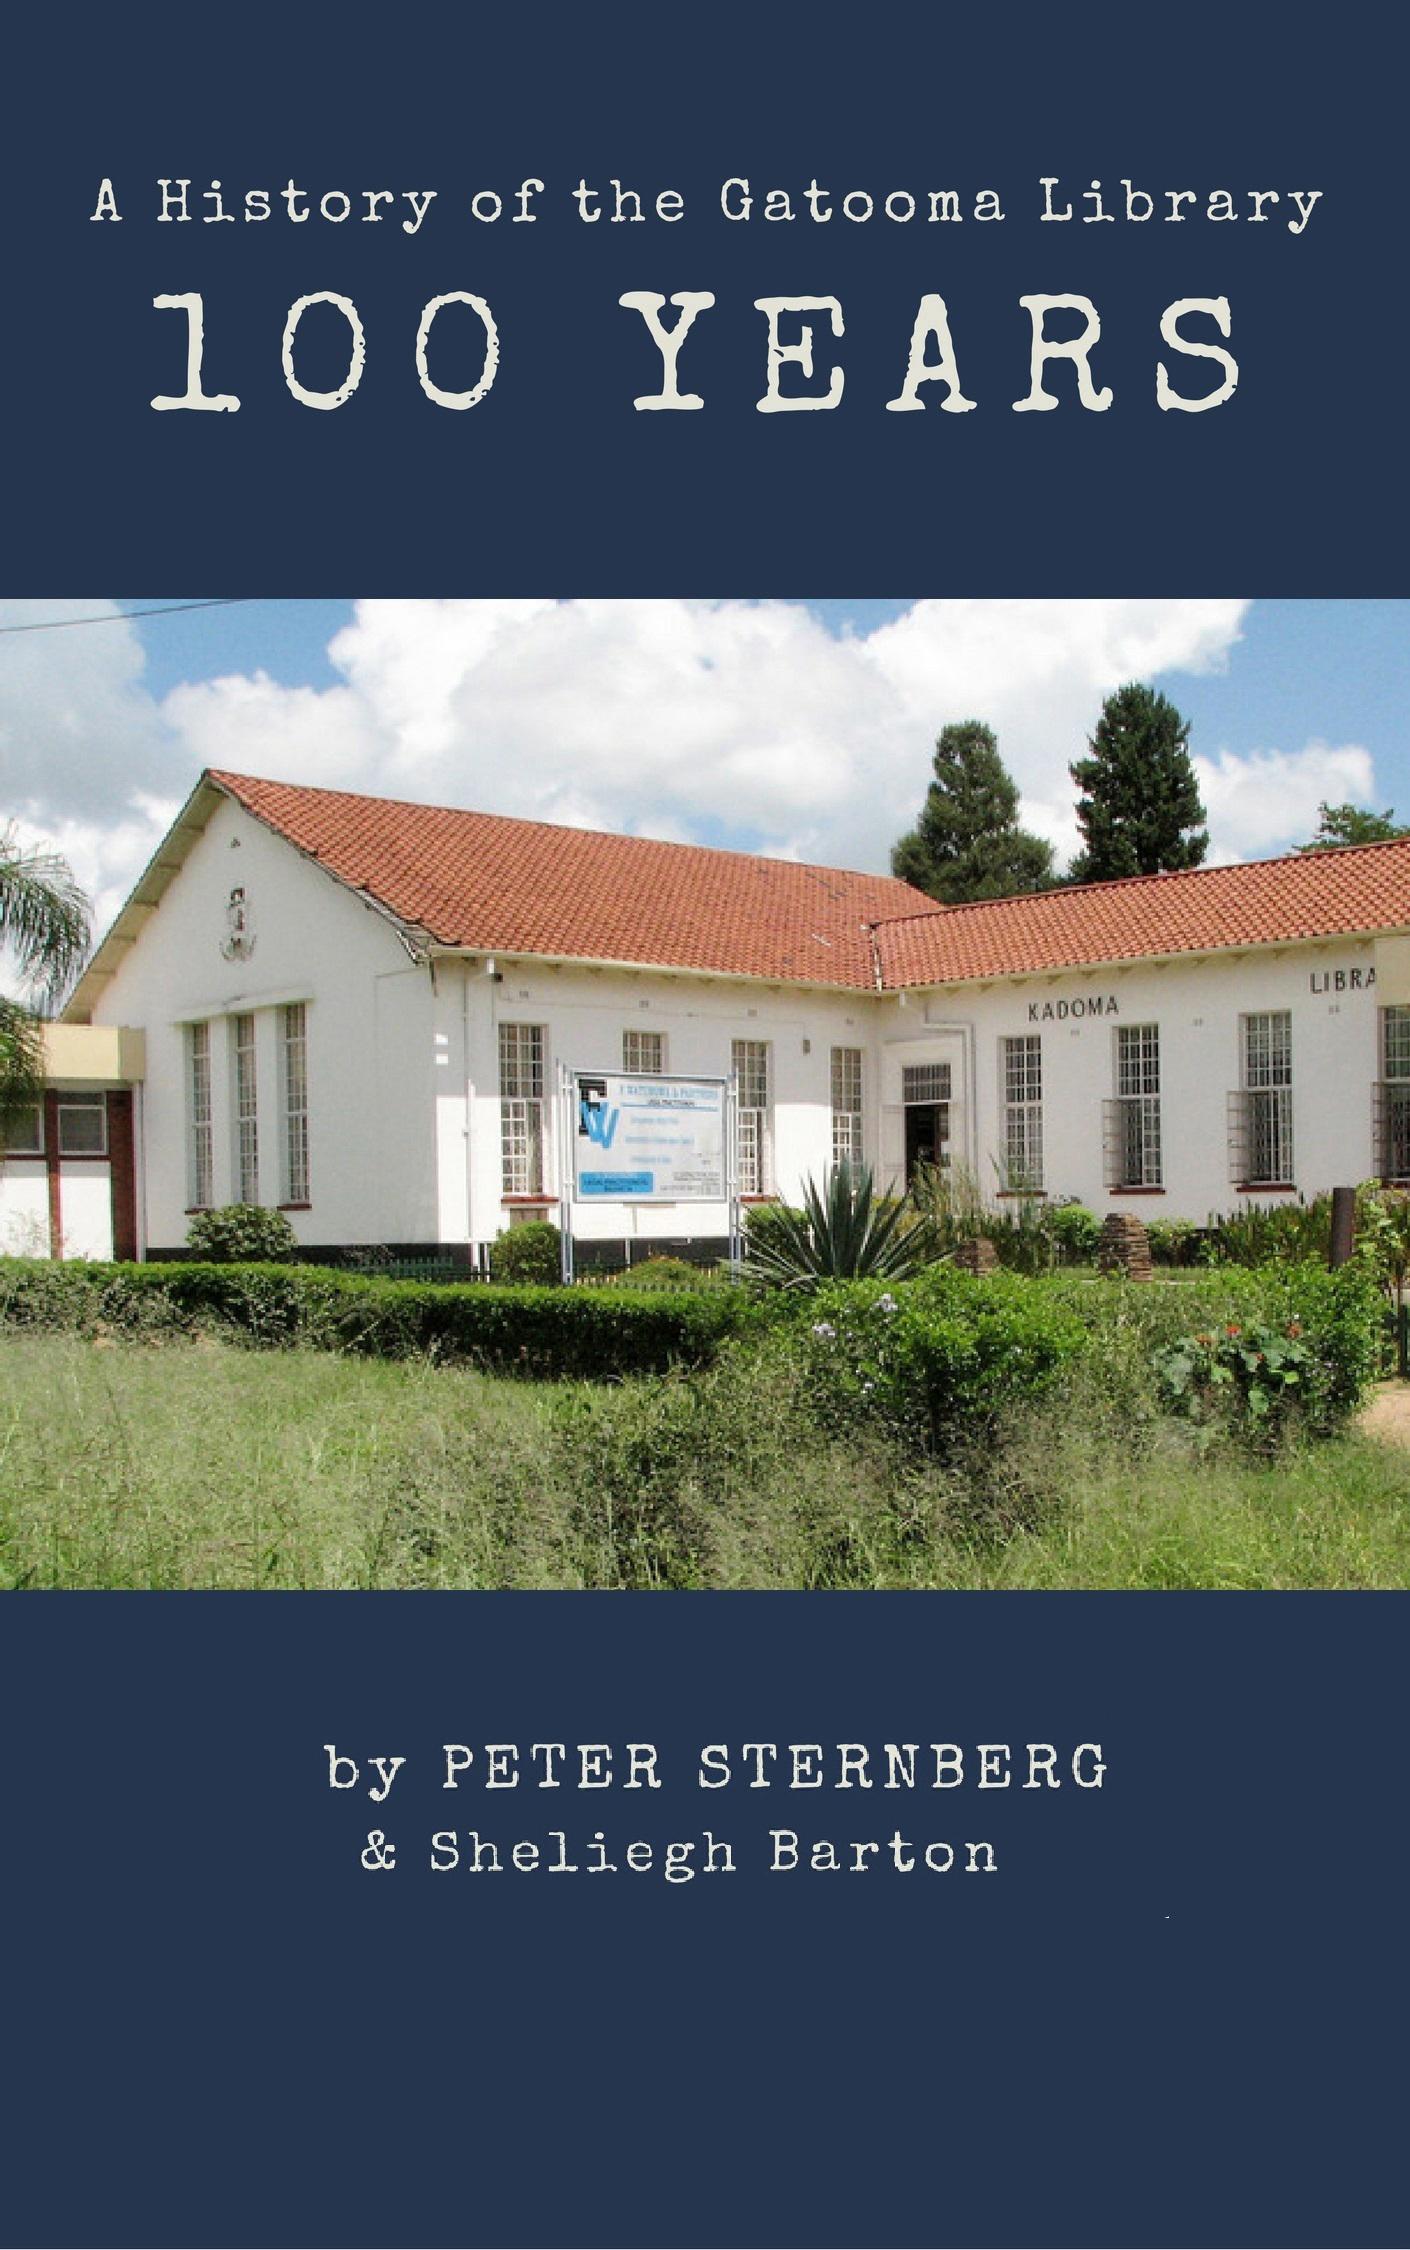 Peter Sternberg, Sheliegh Barton, Gatooma, Library Kadoma